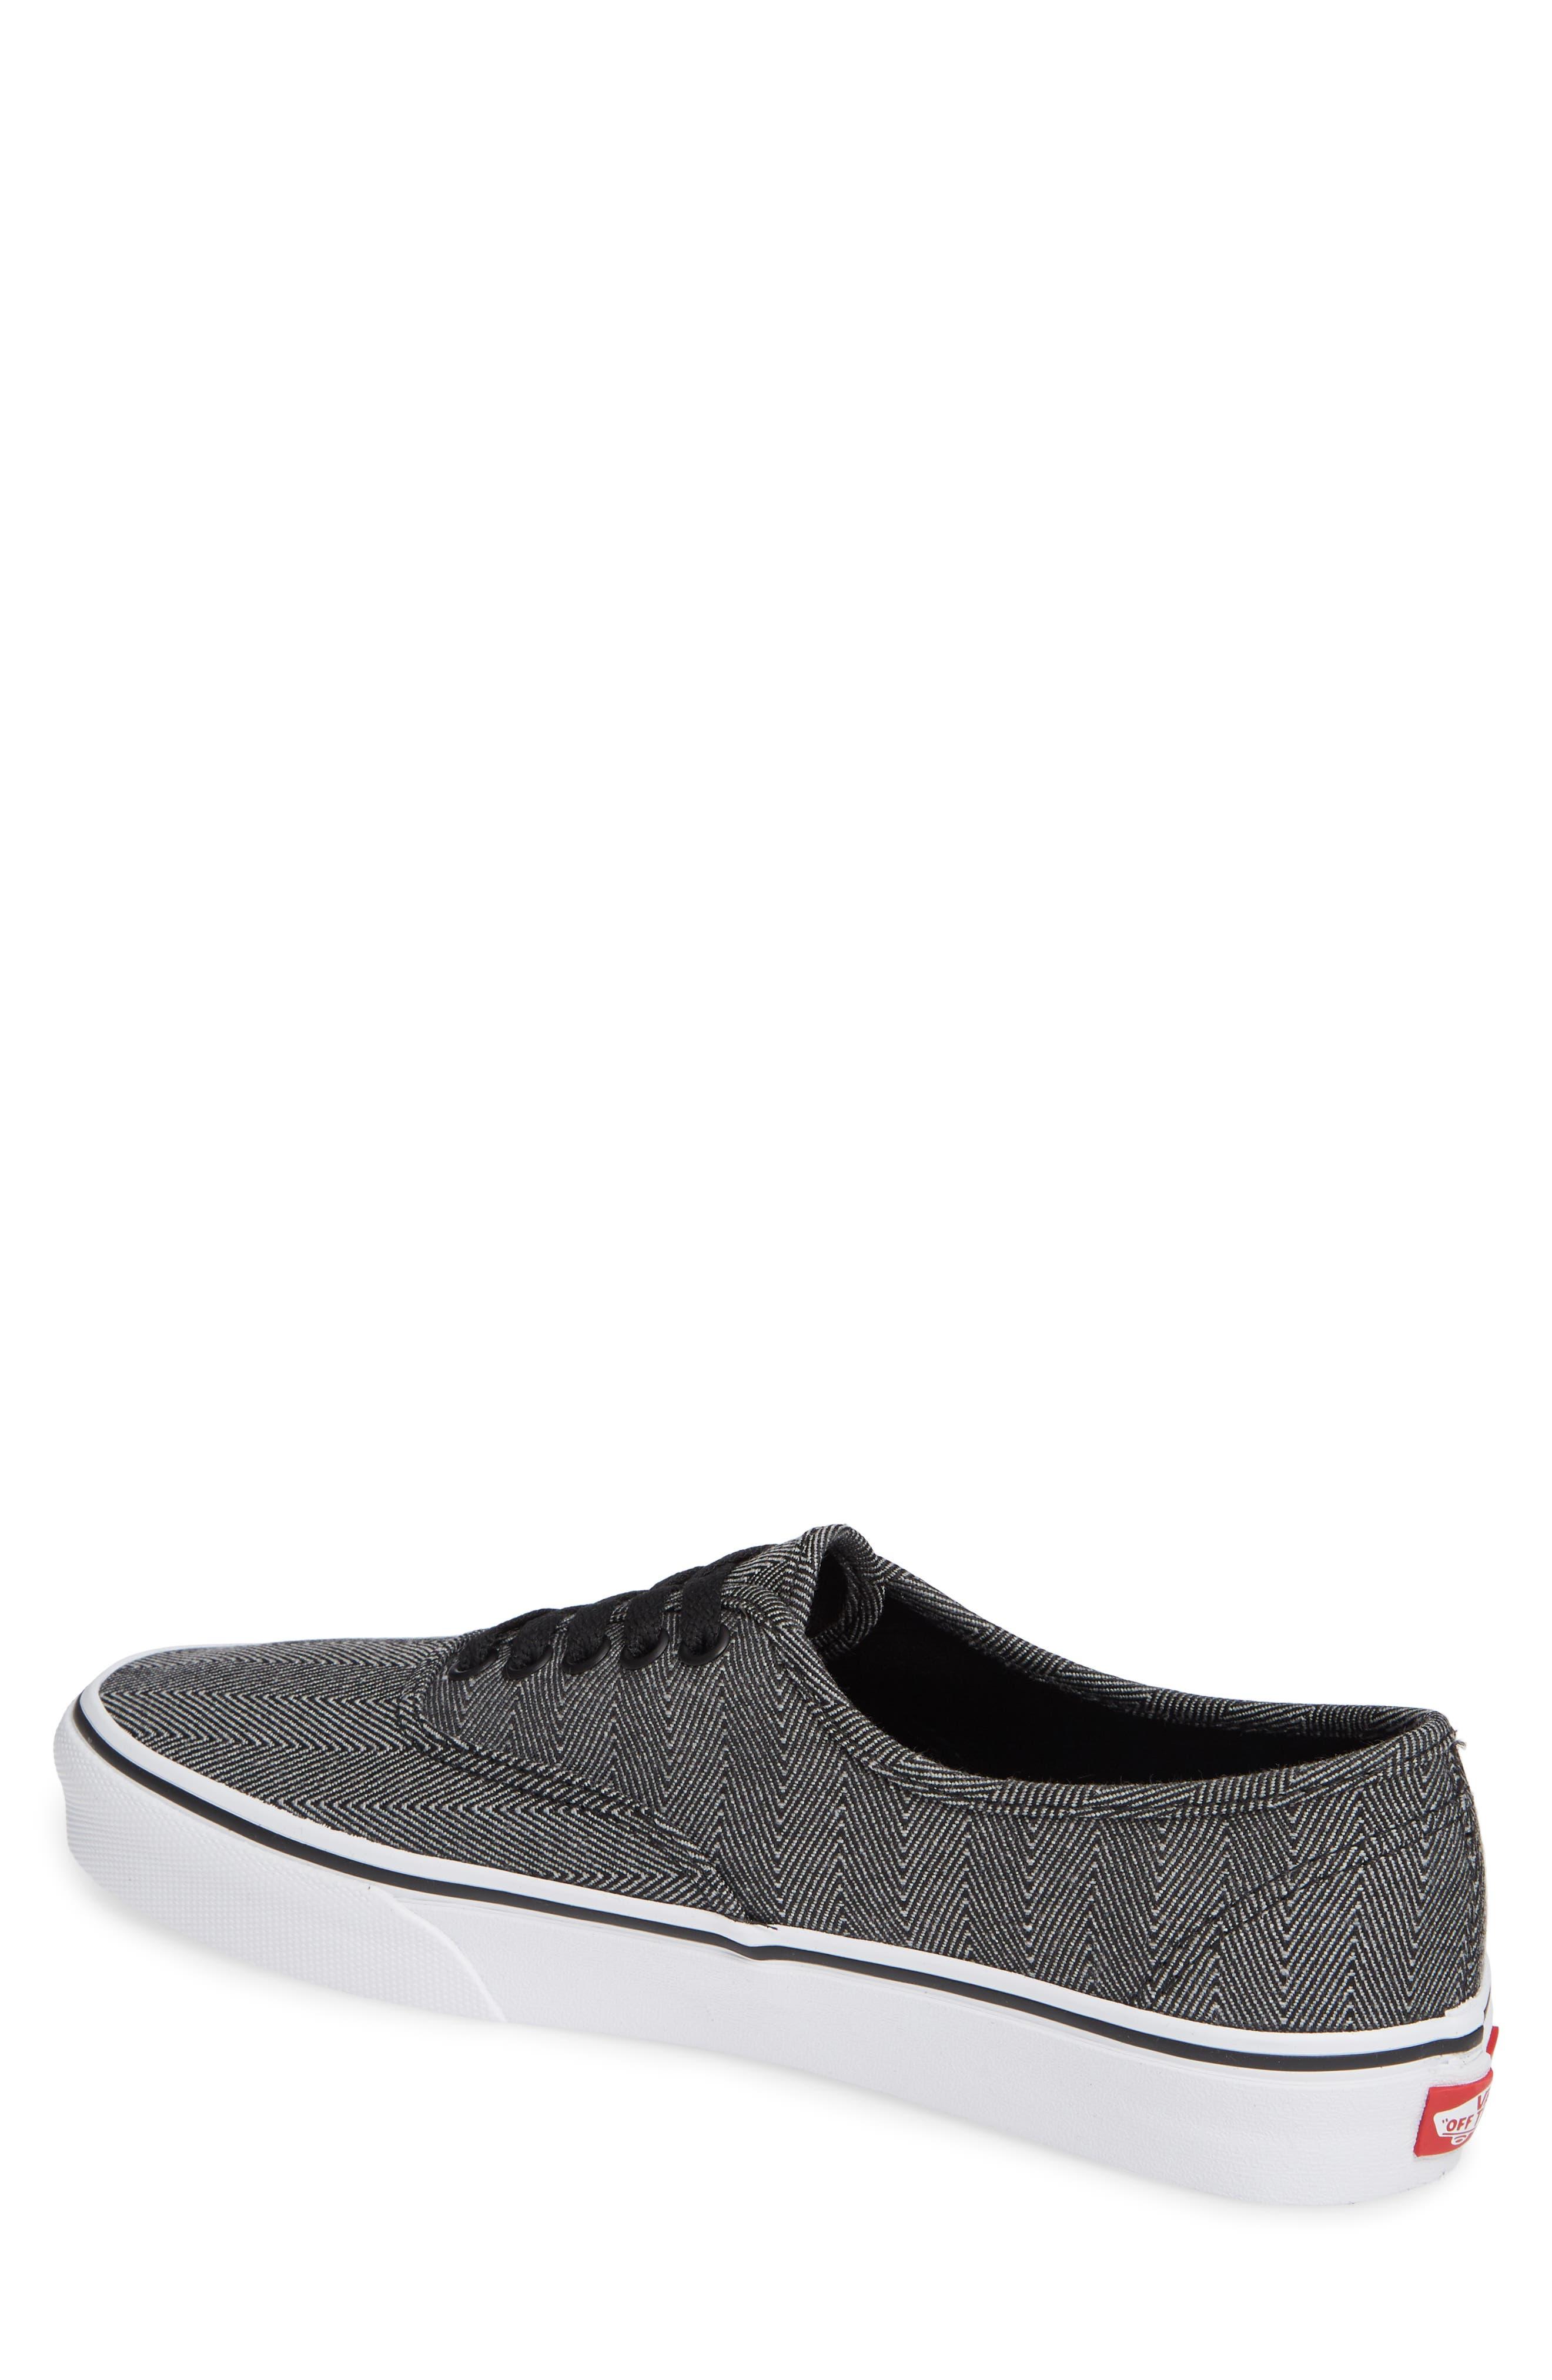 UA Authentic Sneaker,                             Alternate thumbnail 2, color,                             BLACK/ TRUE WHITE